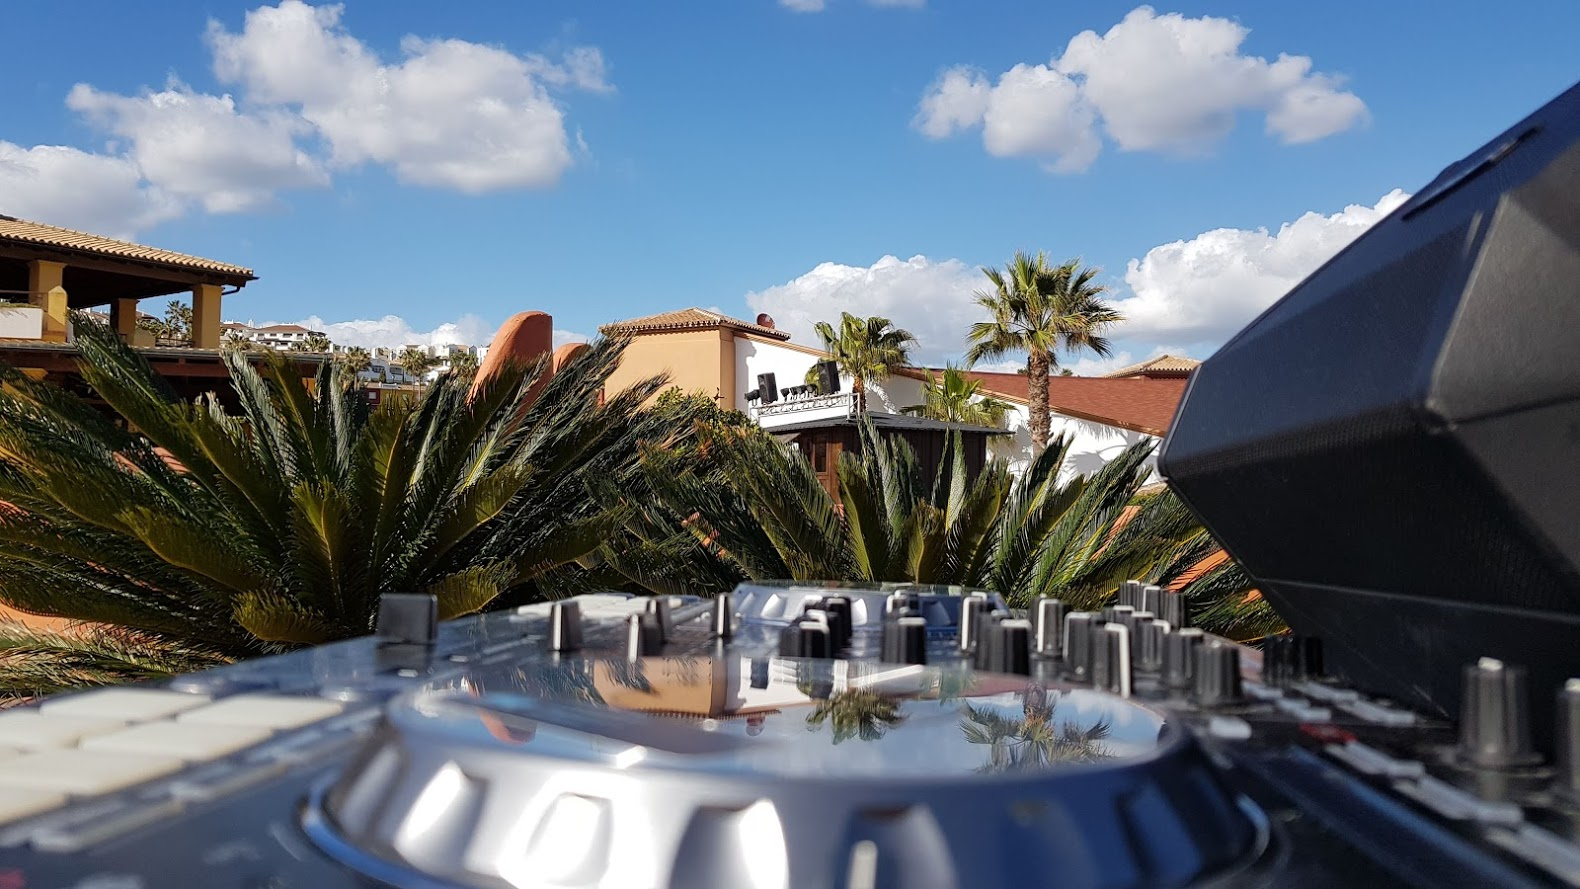 Pool Party @ Holiday Hotel Aldiana